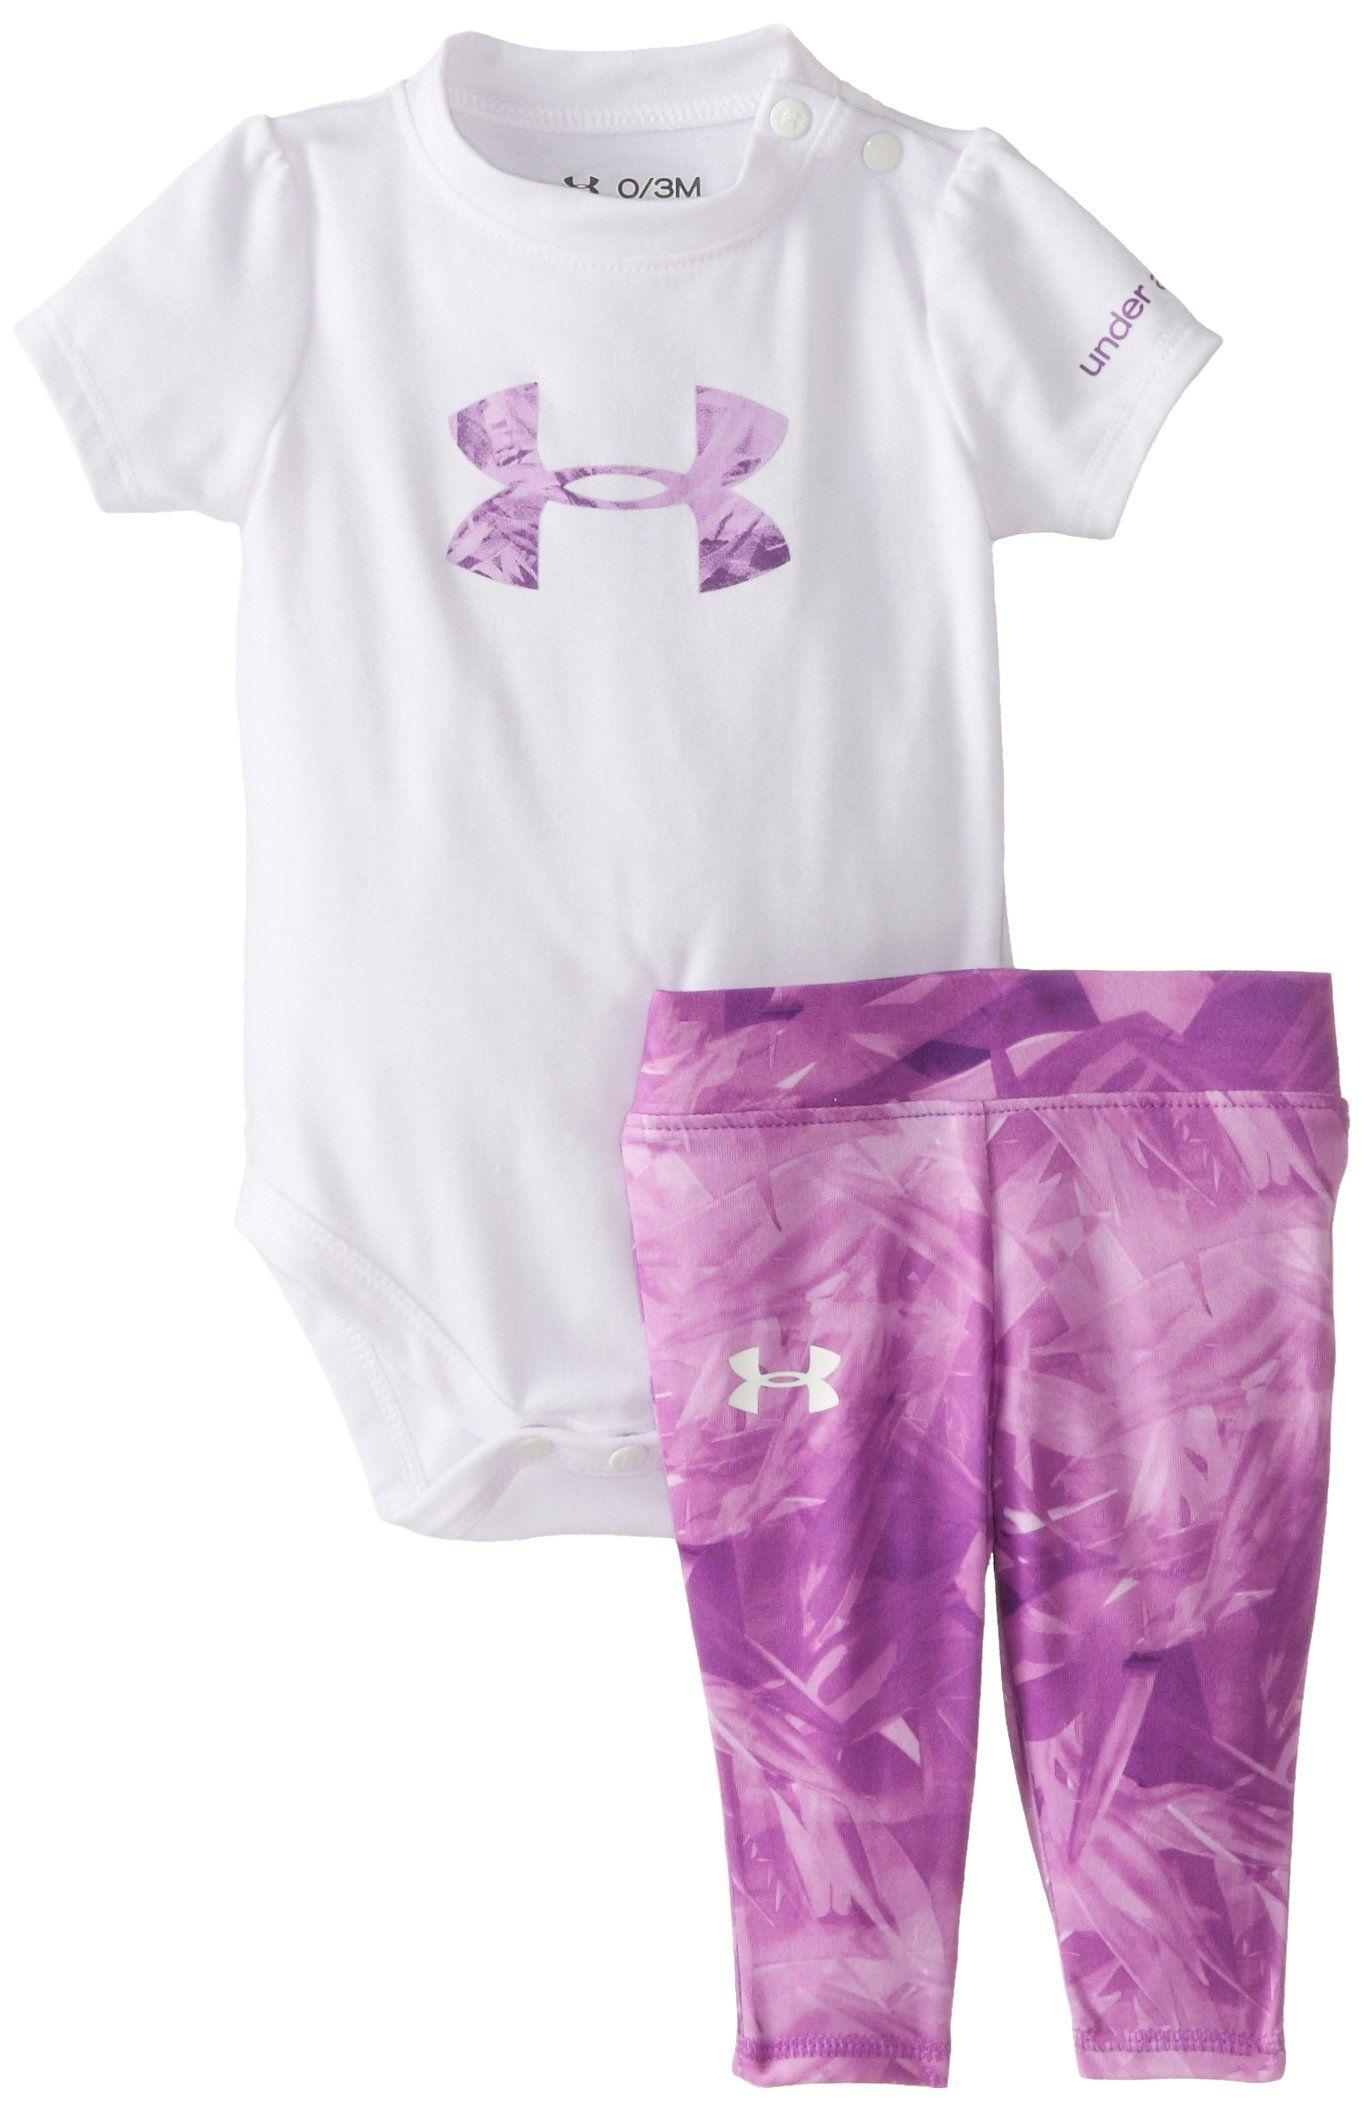 adeea4fc Under Armour Baby-Girls Newborn Jungle Jive Logo Set, White, 3-6 ...